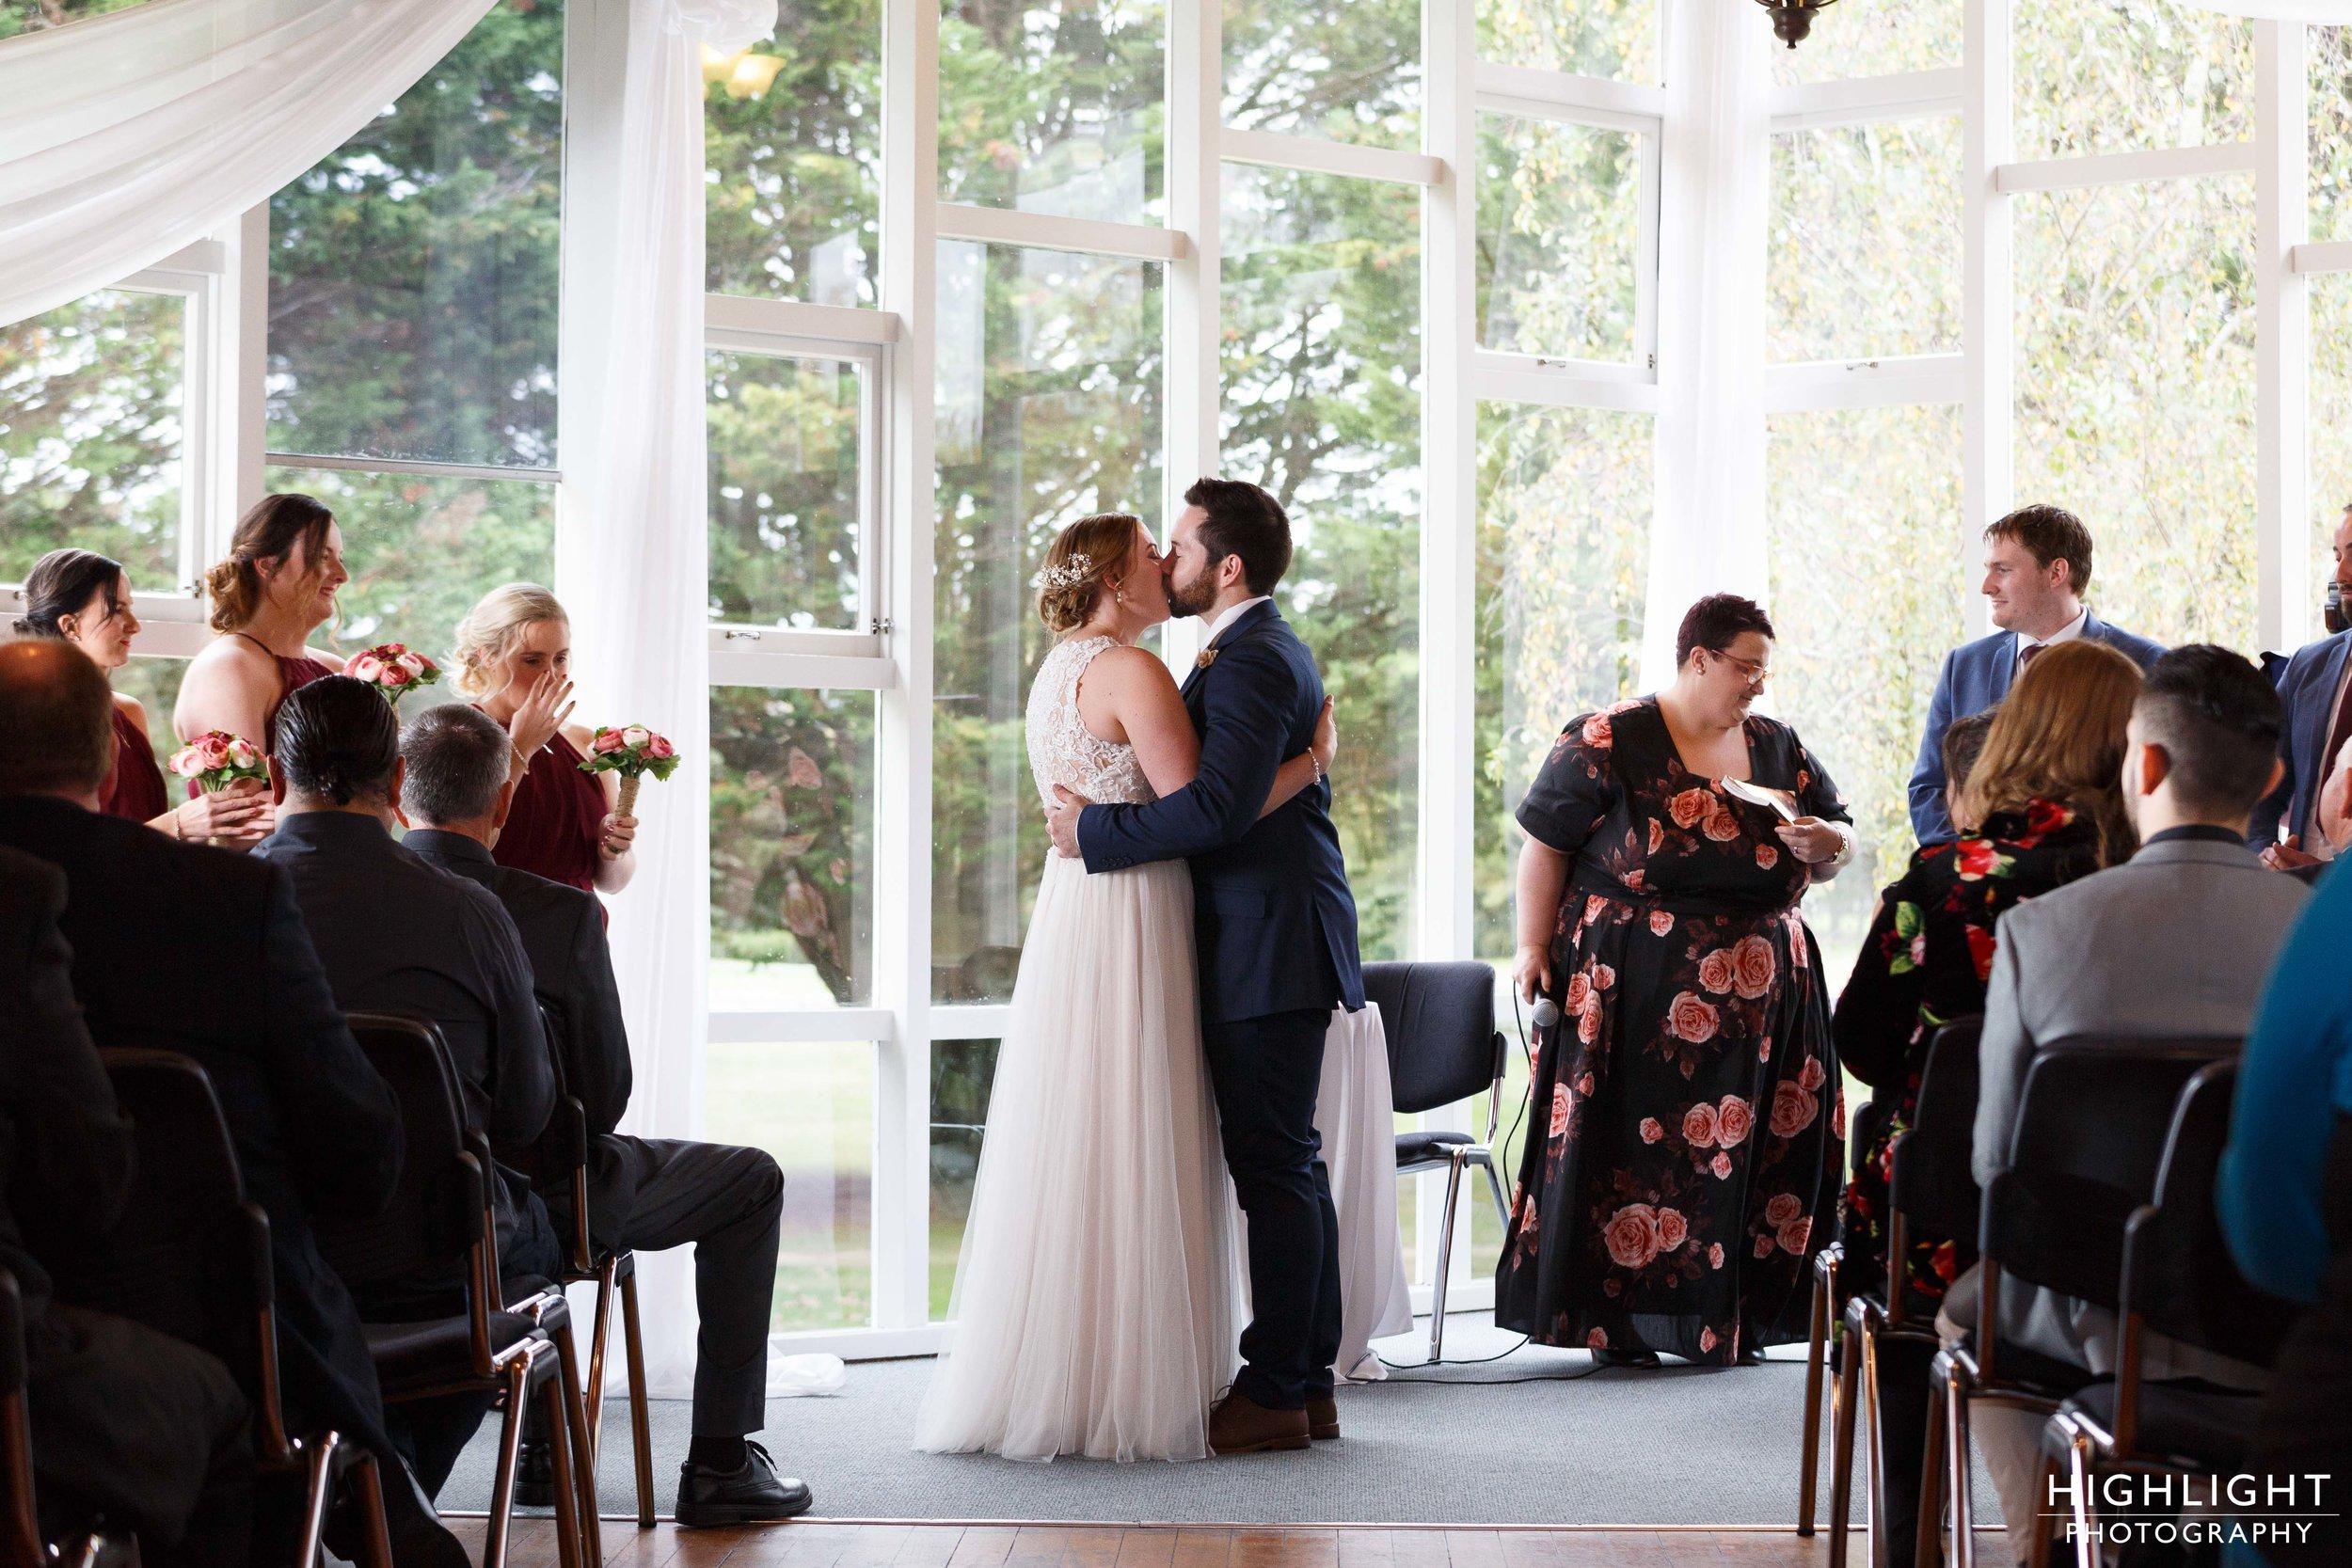 highlight-wedding-photography-palmerston-north-new-zealand-manawatu-chalet-51.jpg